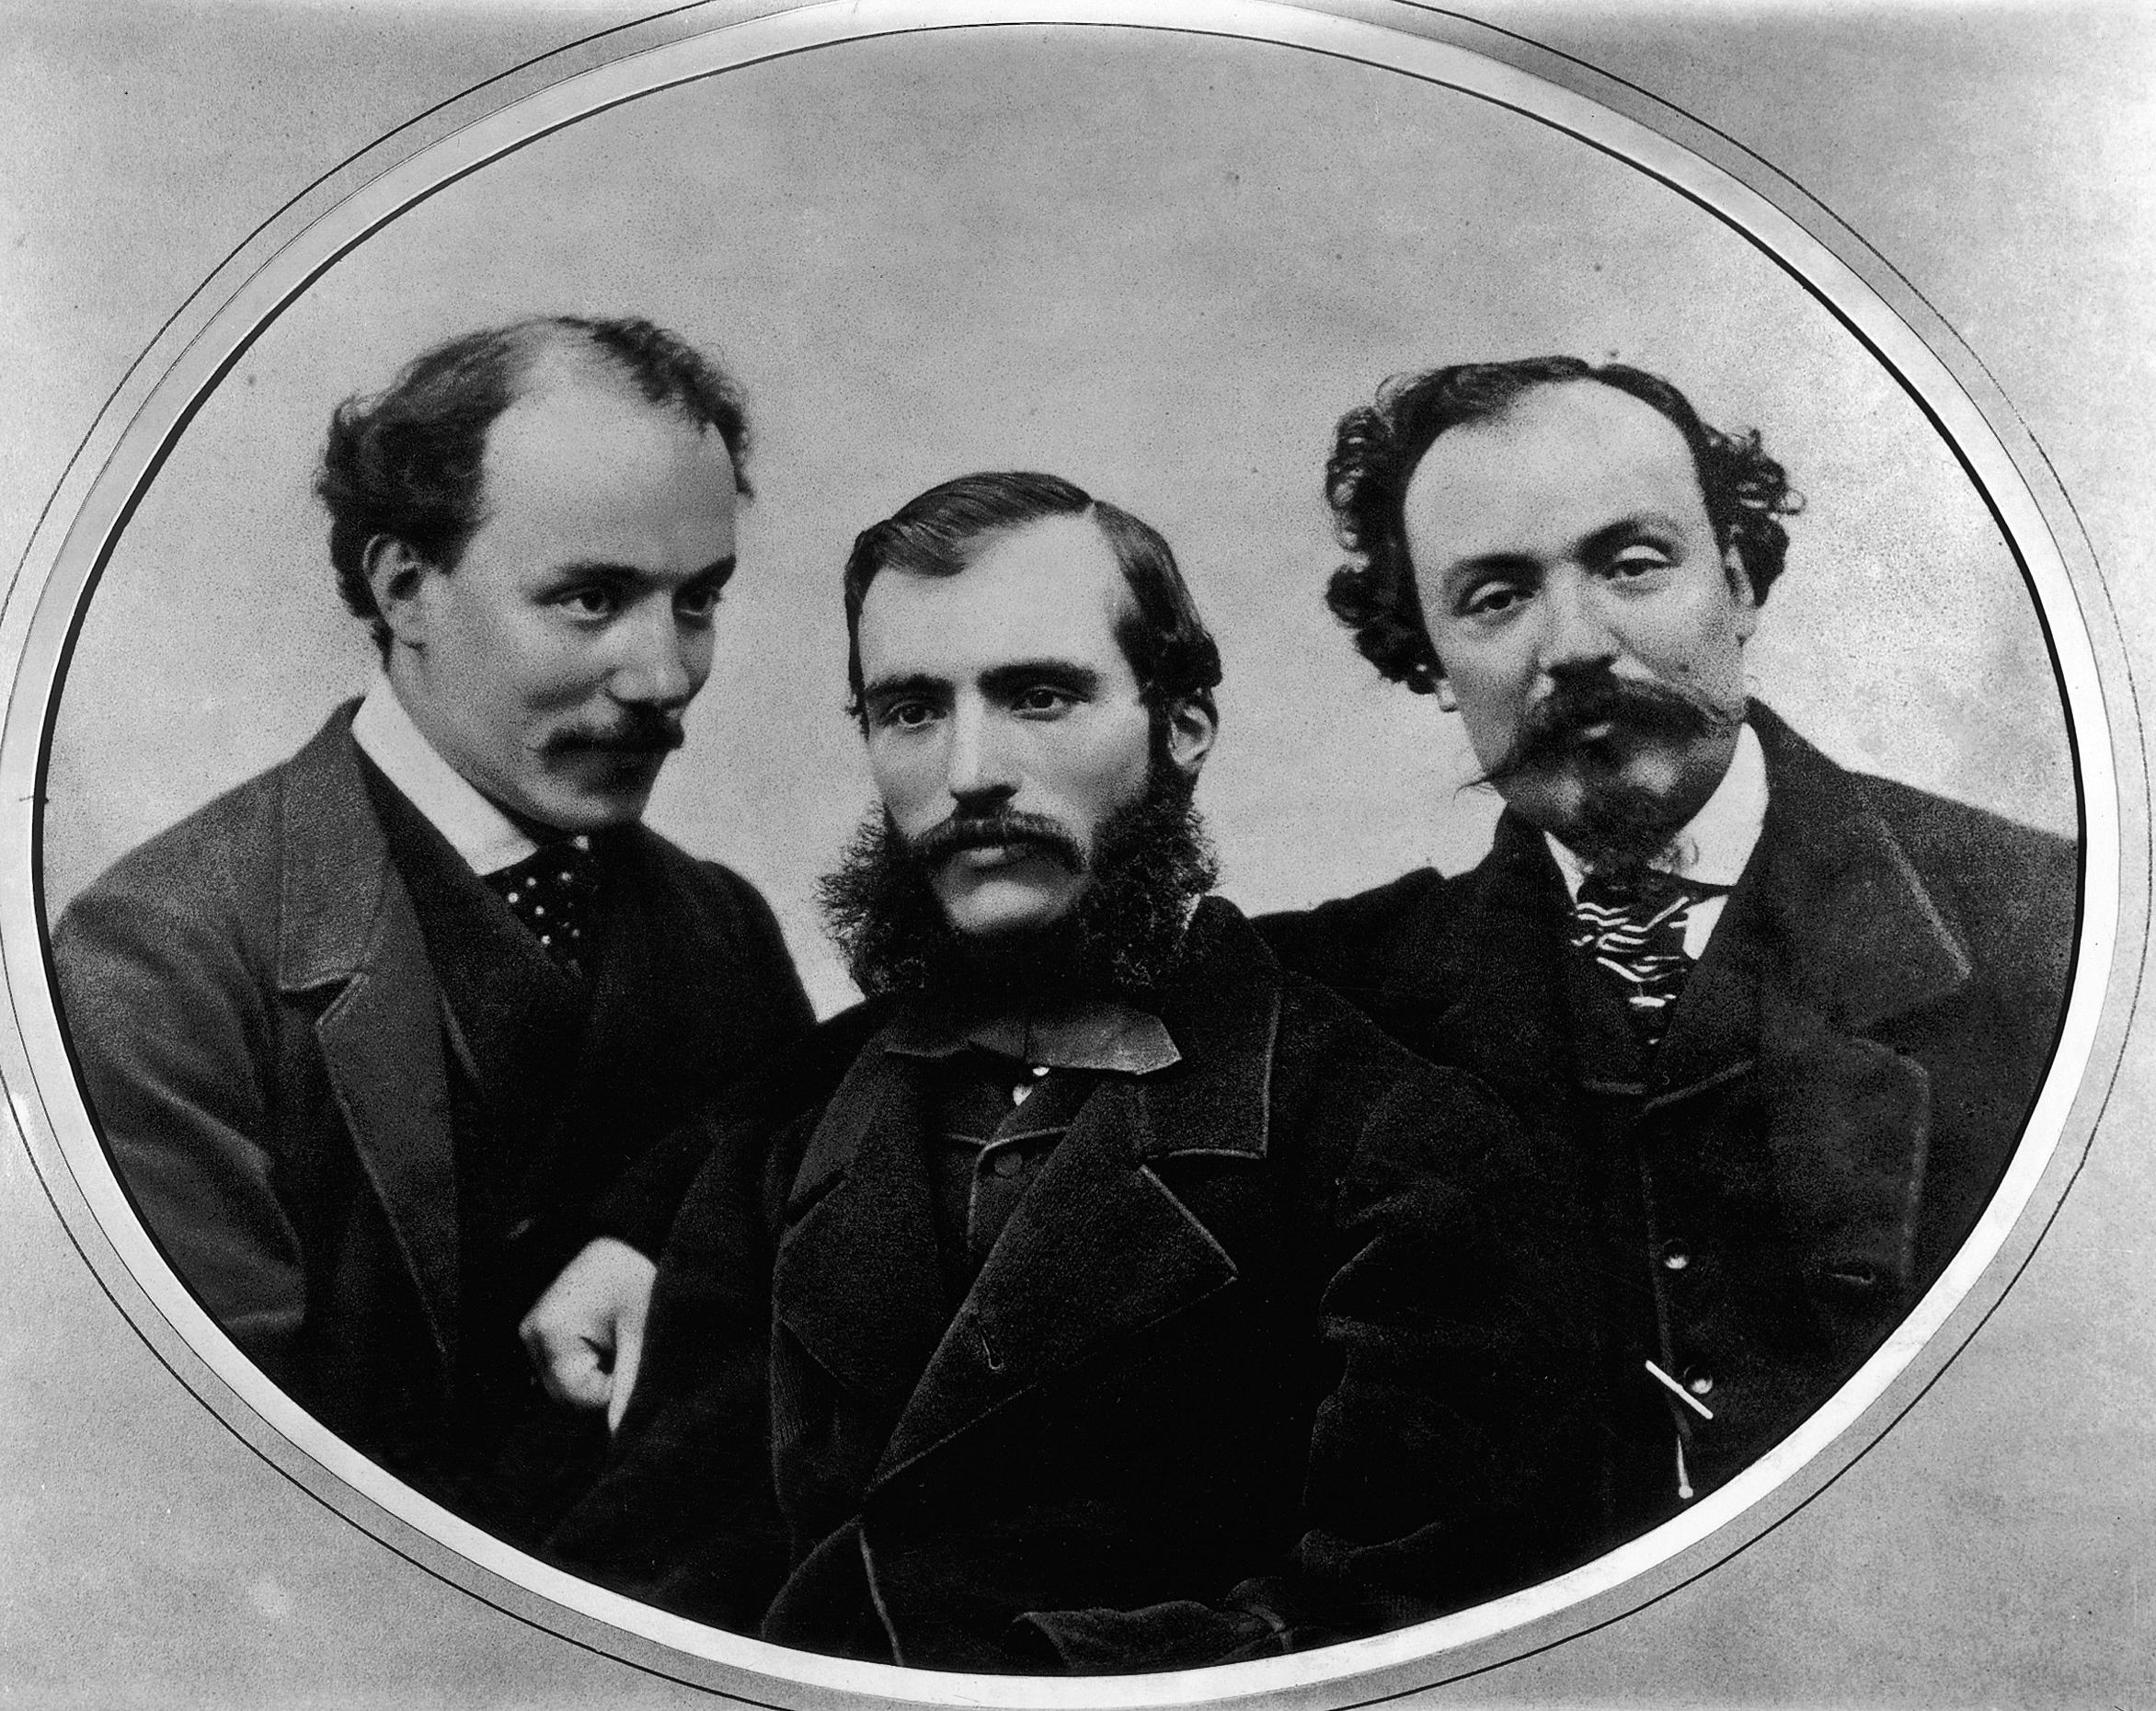 1 Fratelli Alinari_I tre fratelli Alinari Giuseppe Leopoldo e Romualdo_1860_Archivi Alinari_ FirenzeJPG